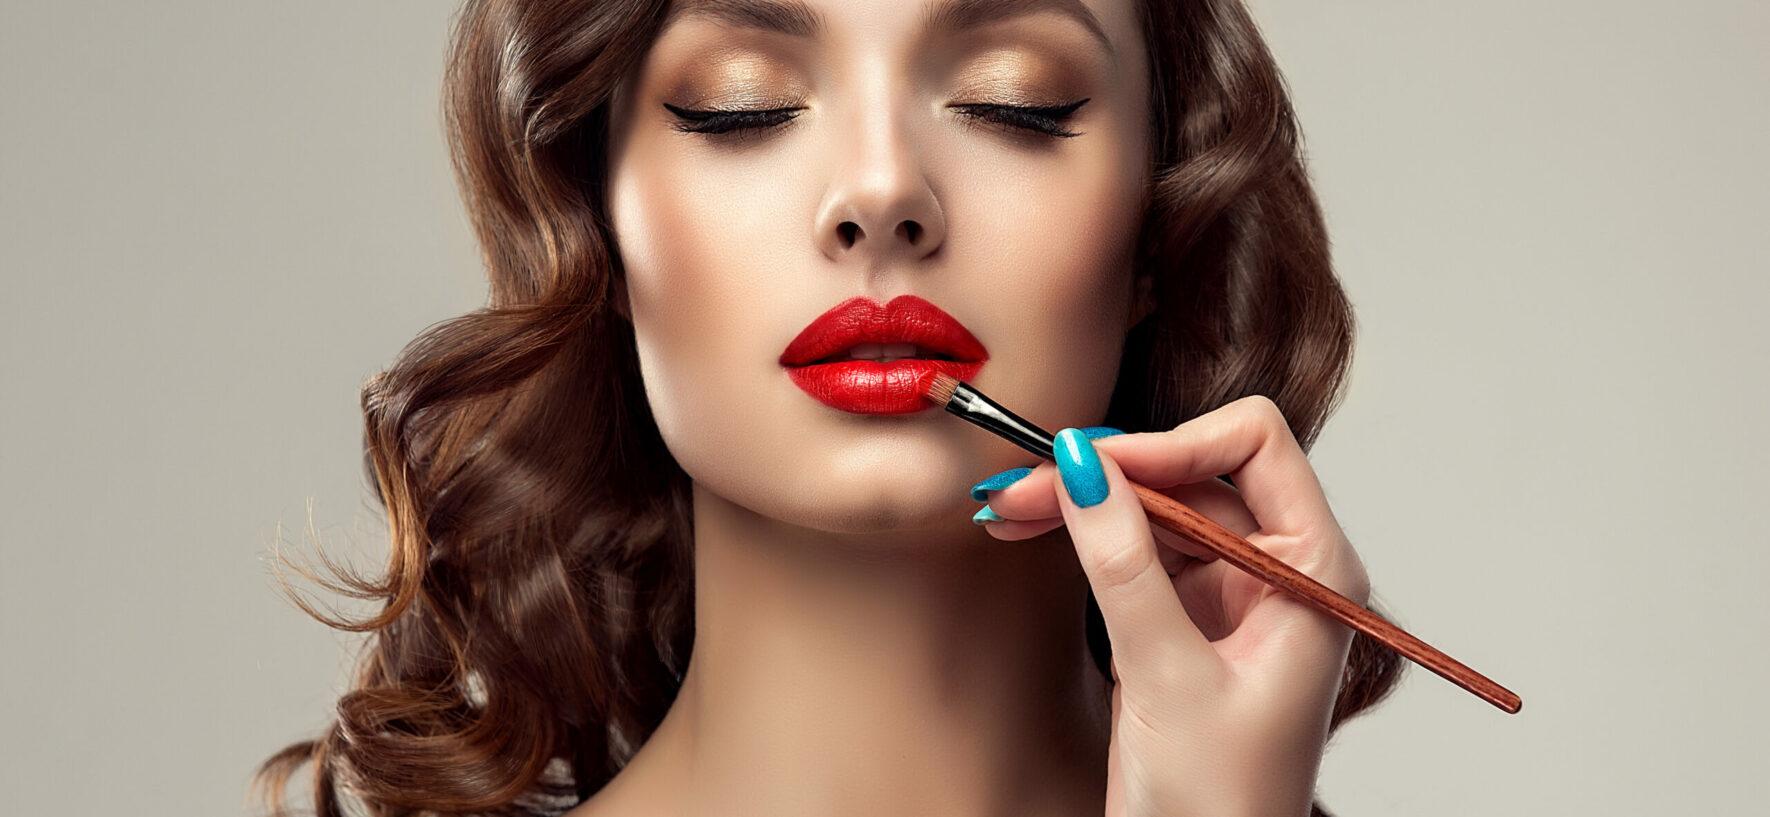 Convenient Beauty Makeup Hacks For Brides -To-Be